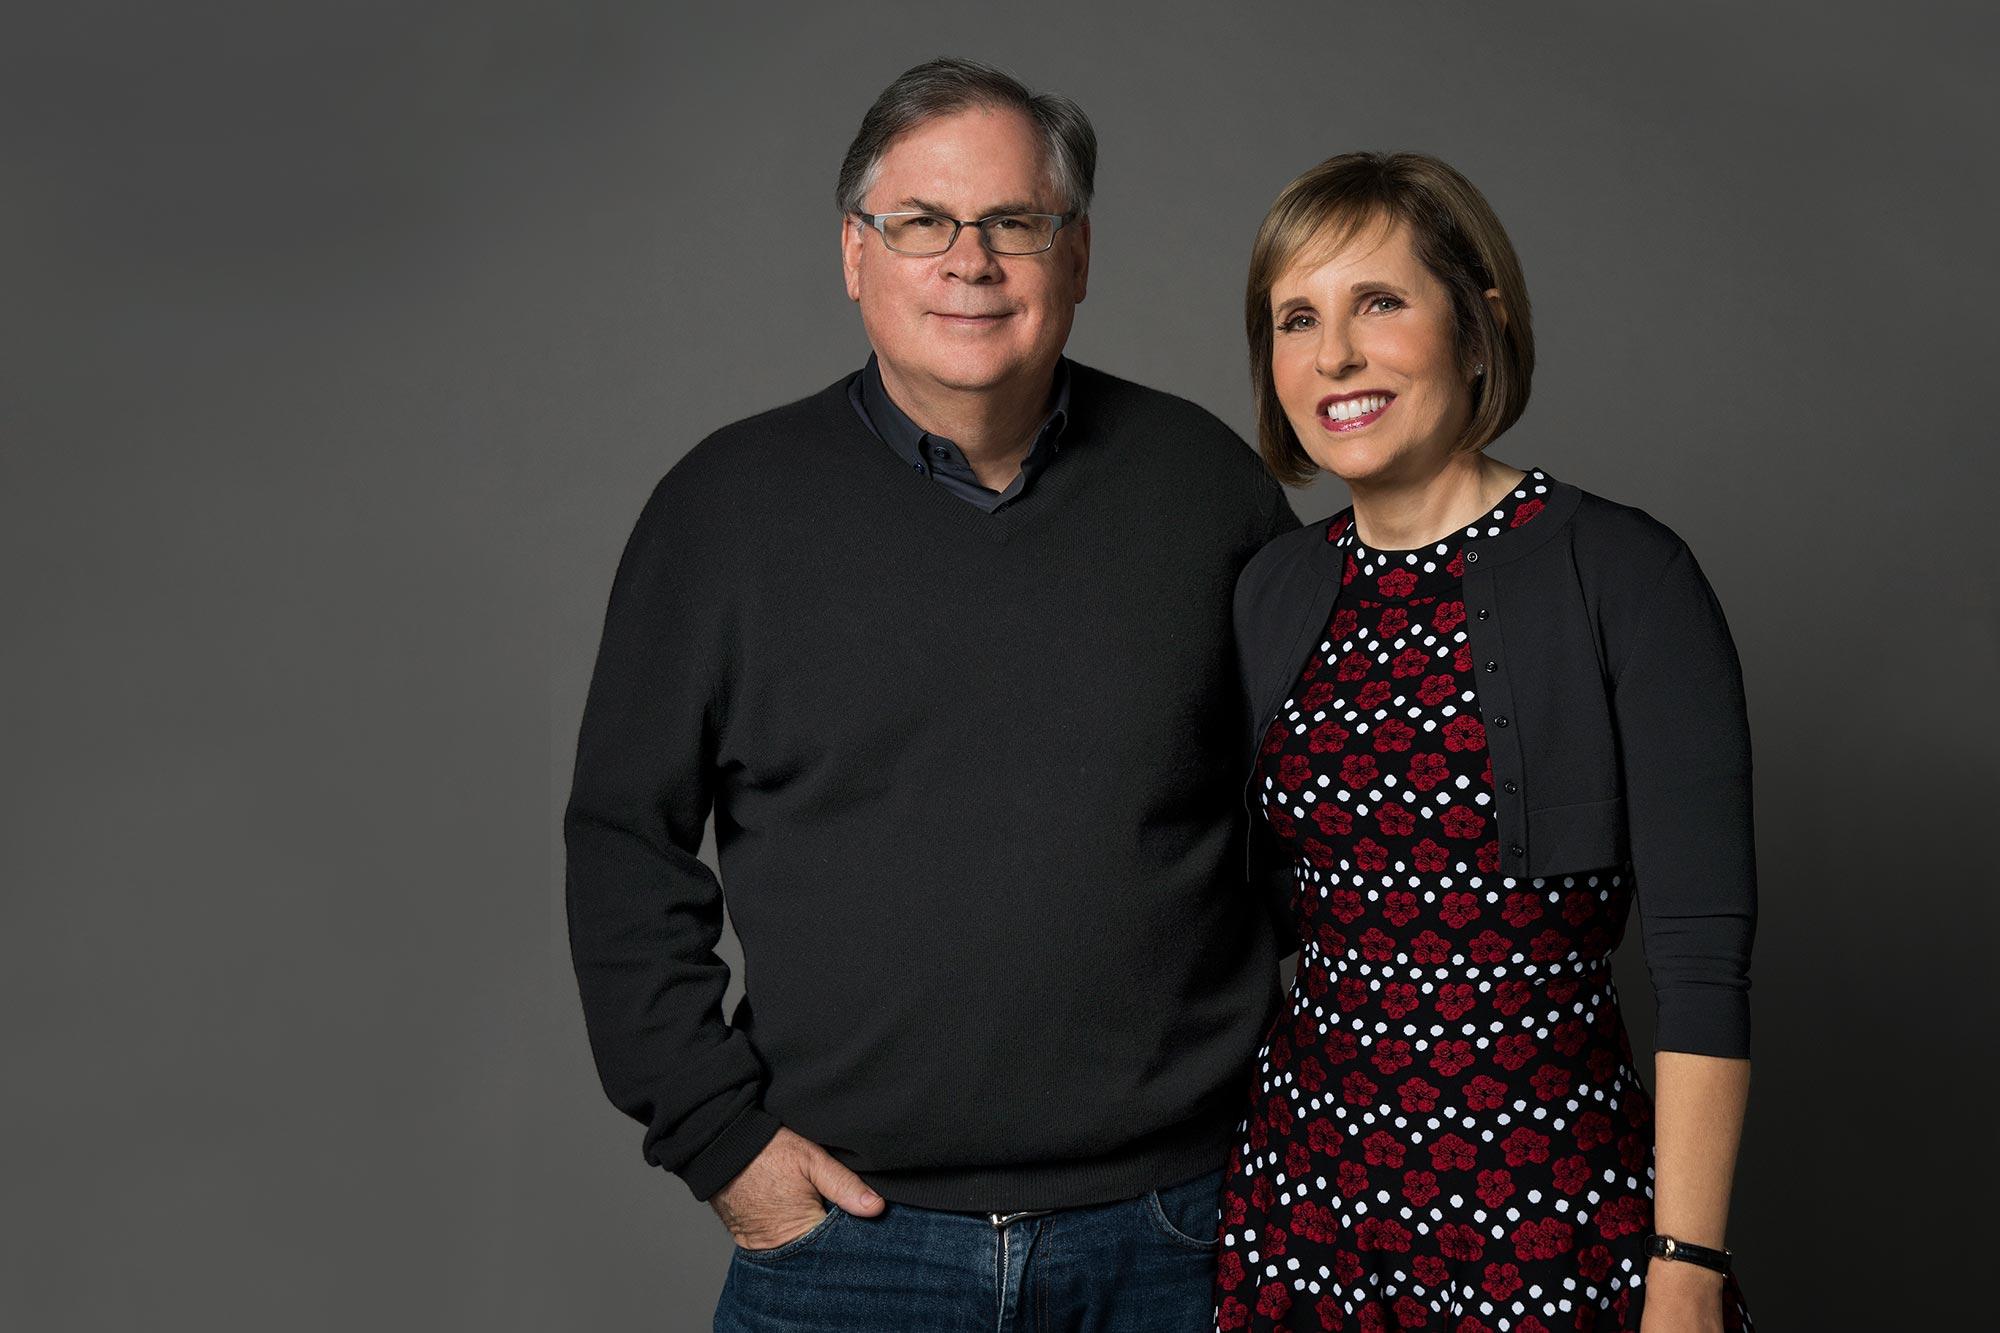 Michelle King, Robert King